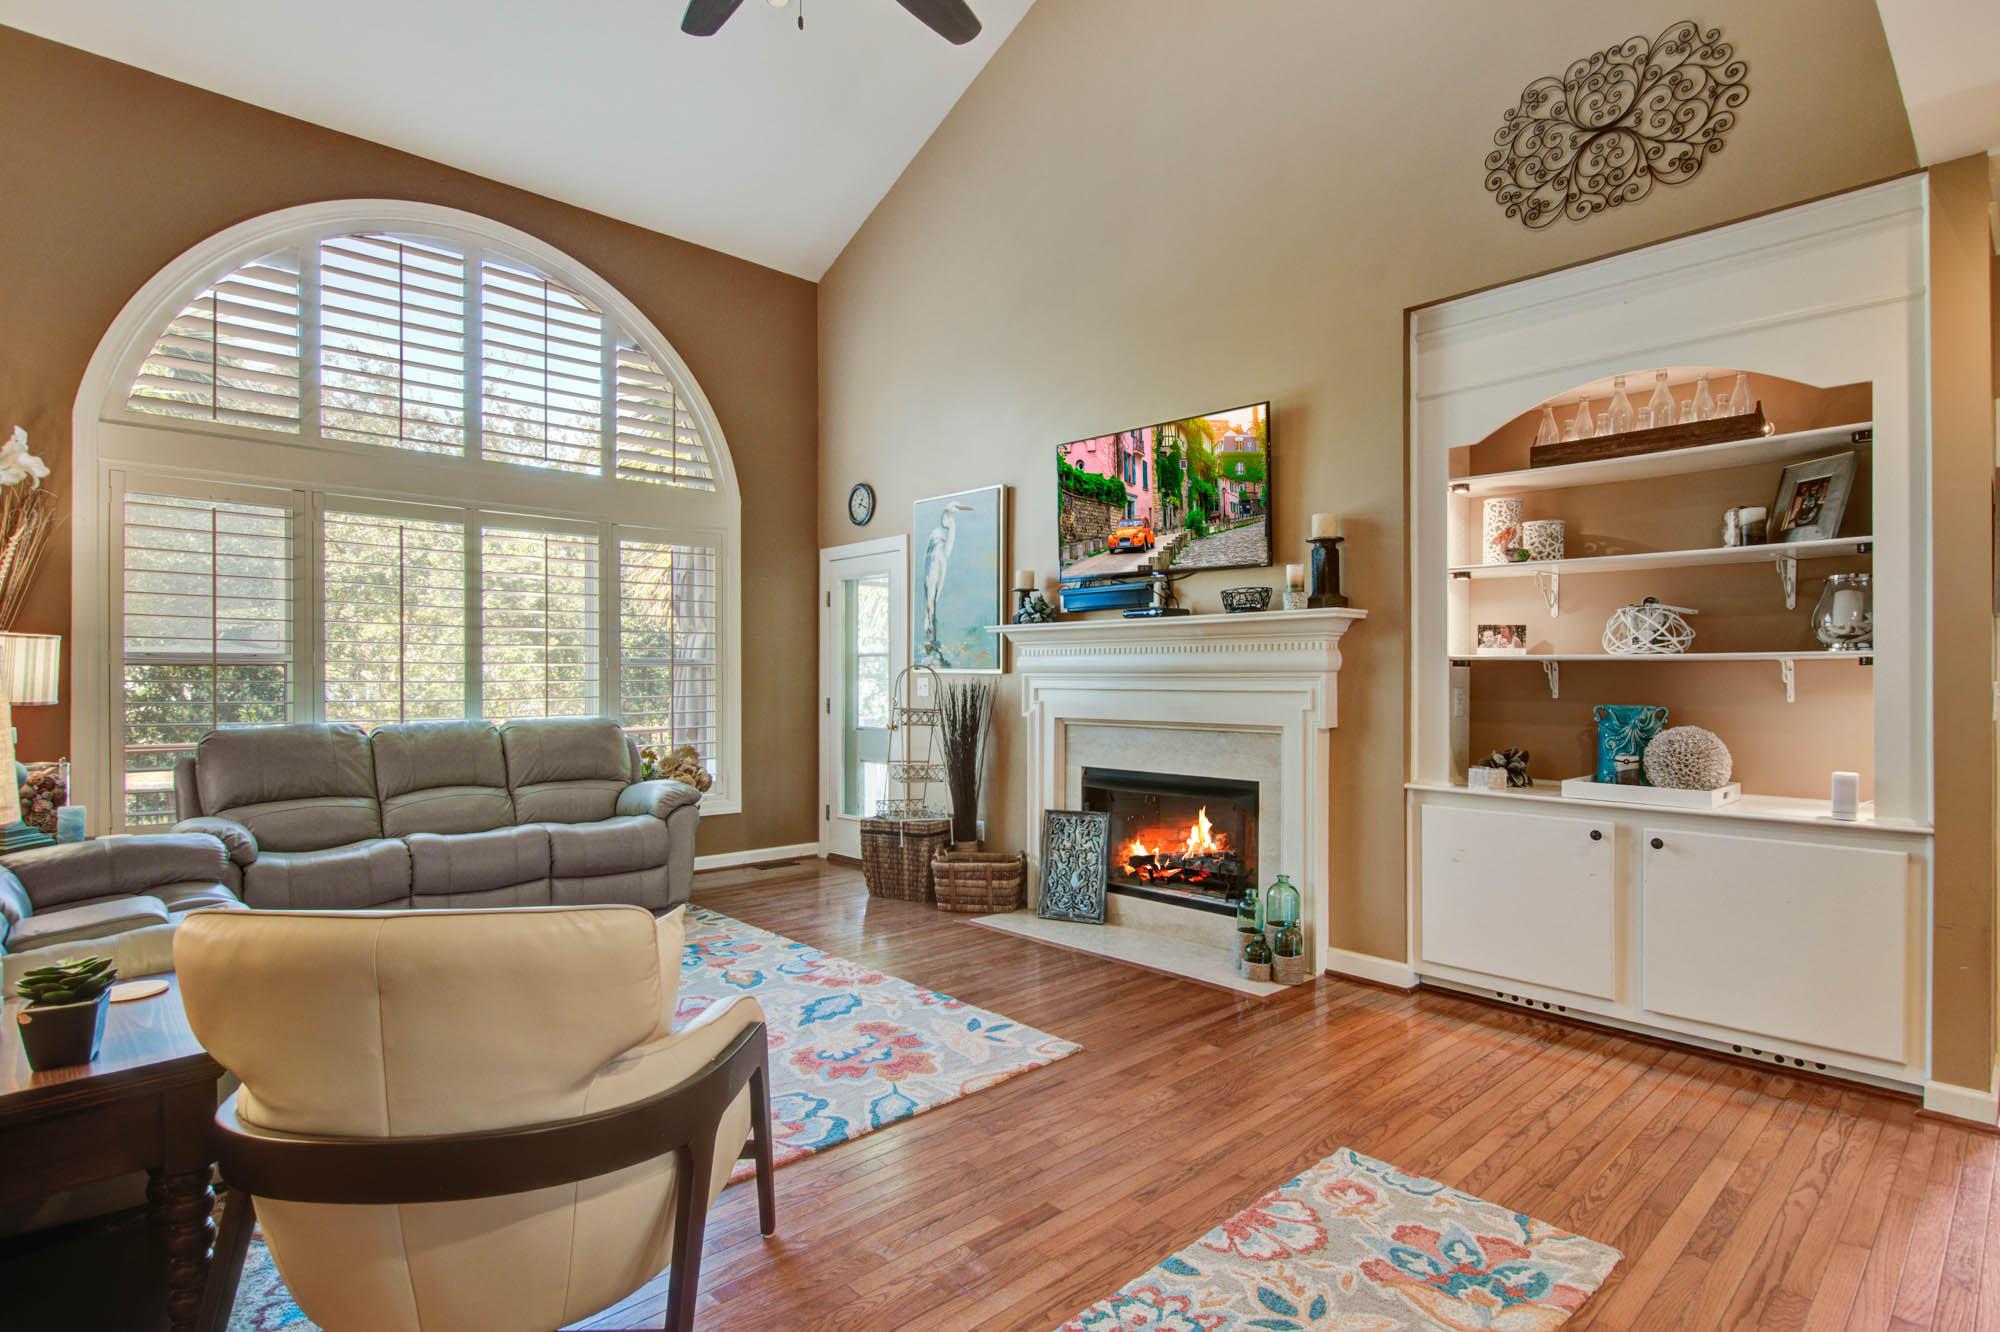 St Thomas Point Homes For Sale - 307 Jamesbury, Charleston, SC - 37